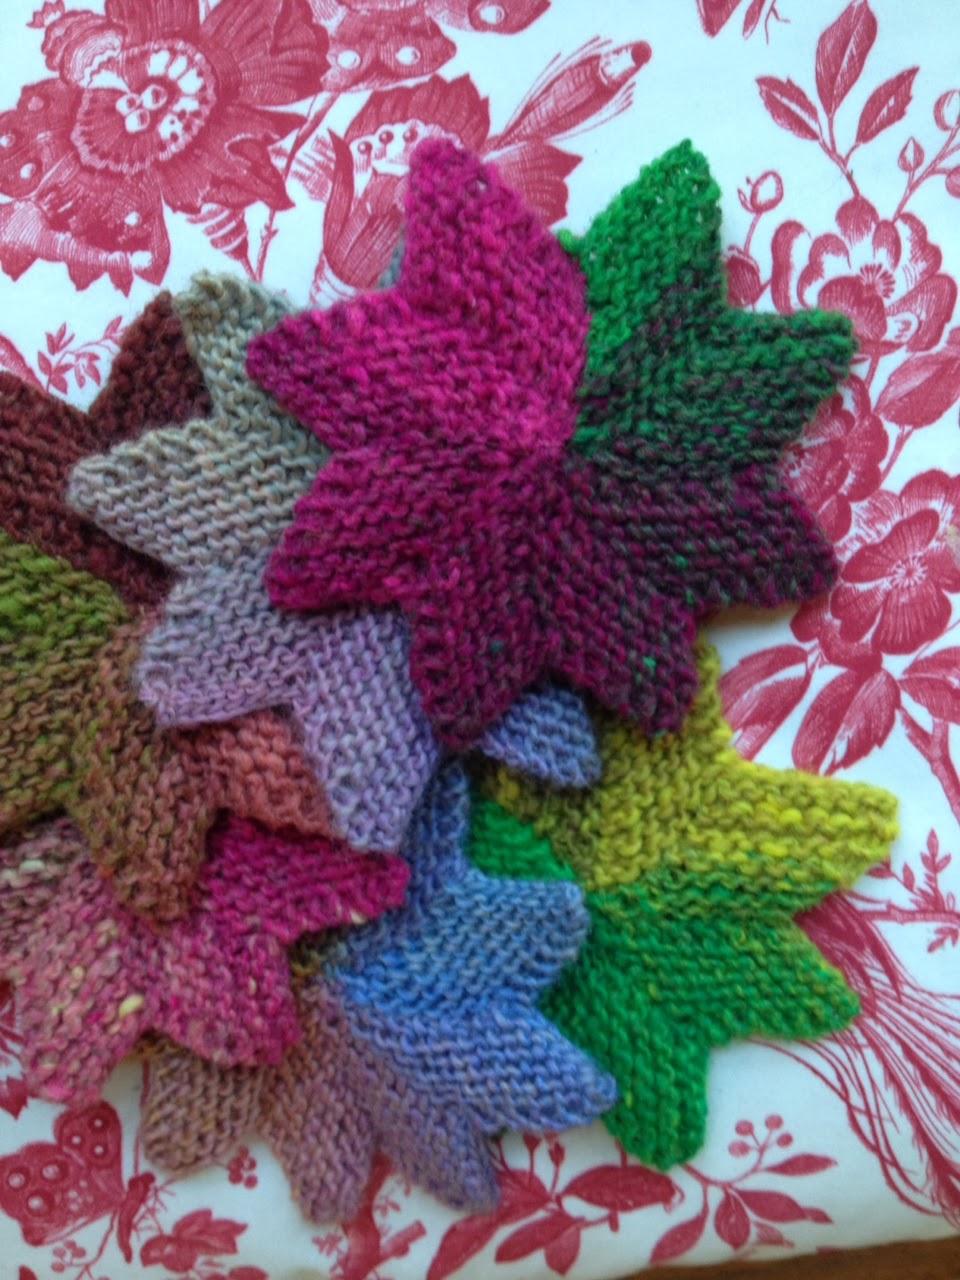 knitnscribble.com: Christmas star knitting pattern